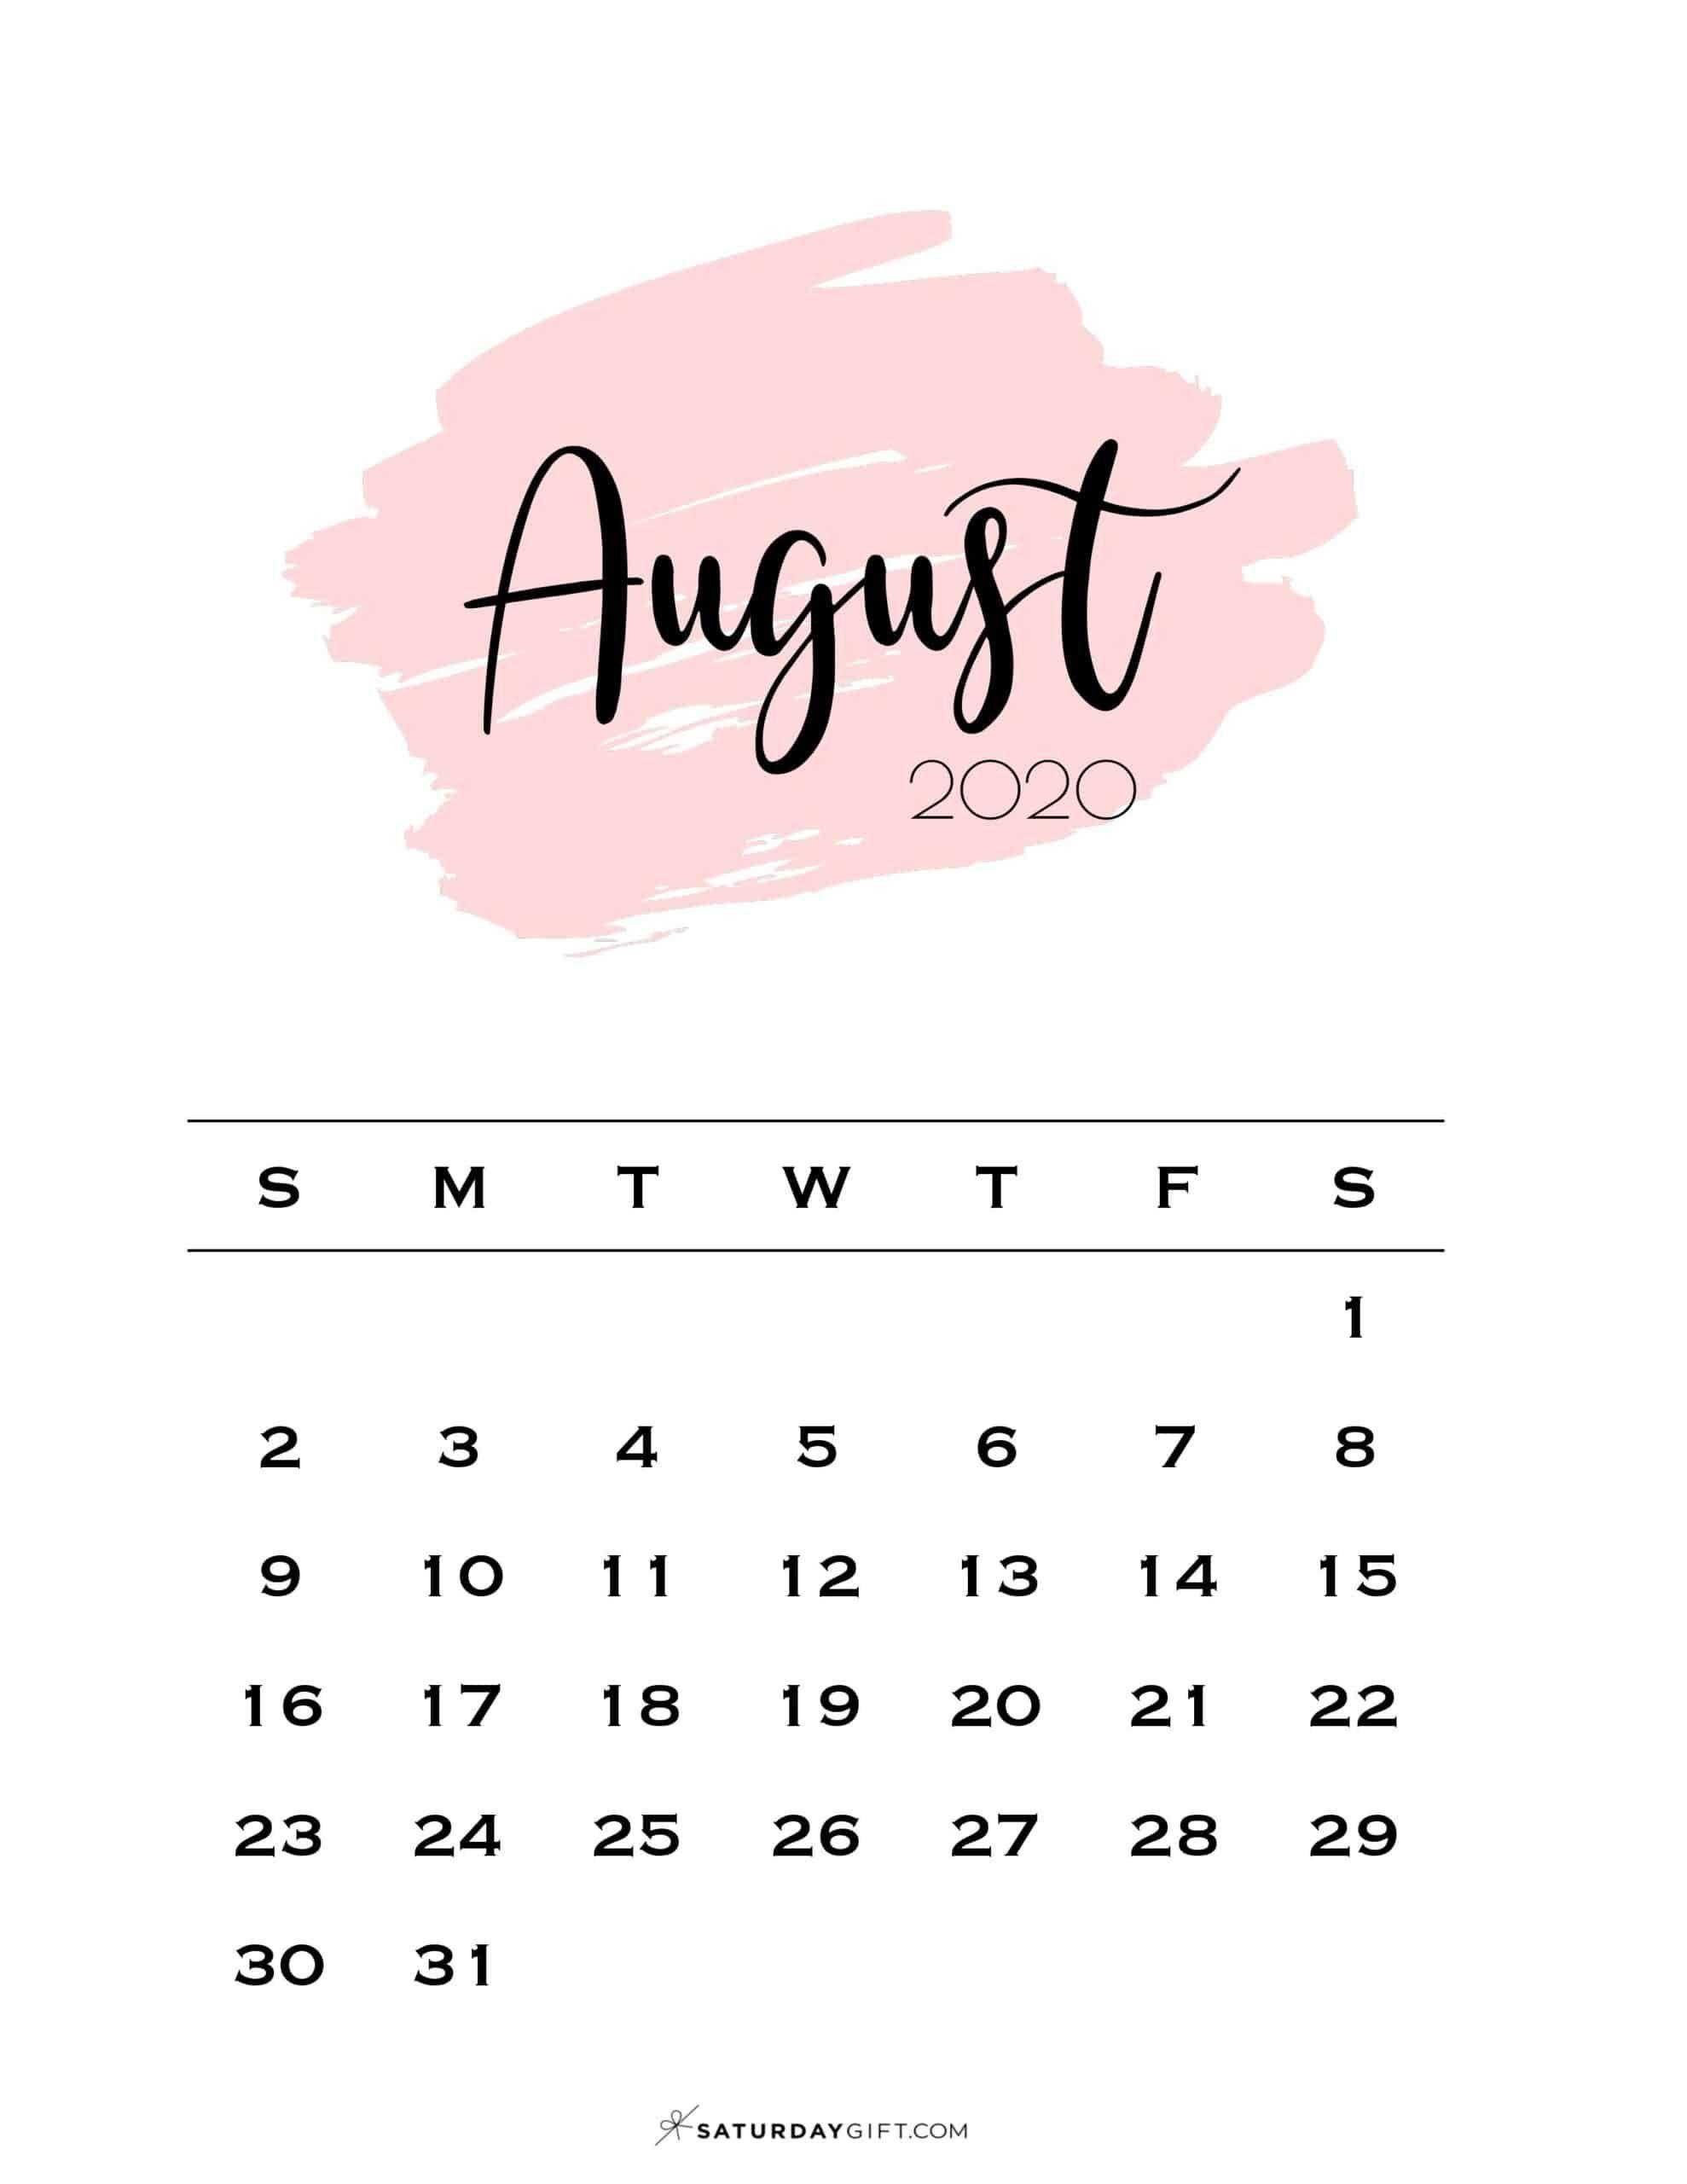 August 2021 Calendar Wallpaper Cute (& Free!) Printable August 2021 Calendar | SaturdayGift in